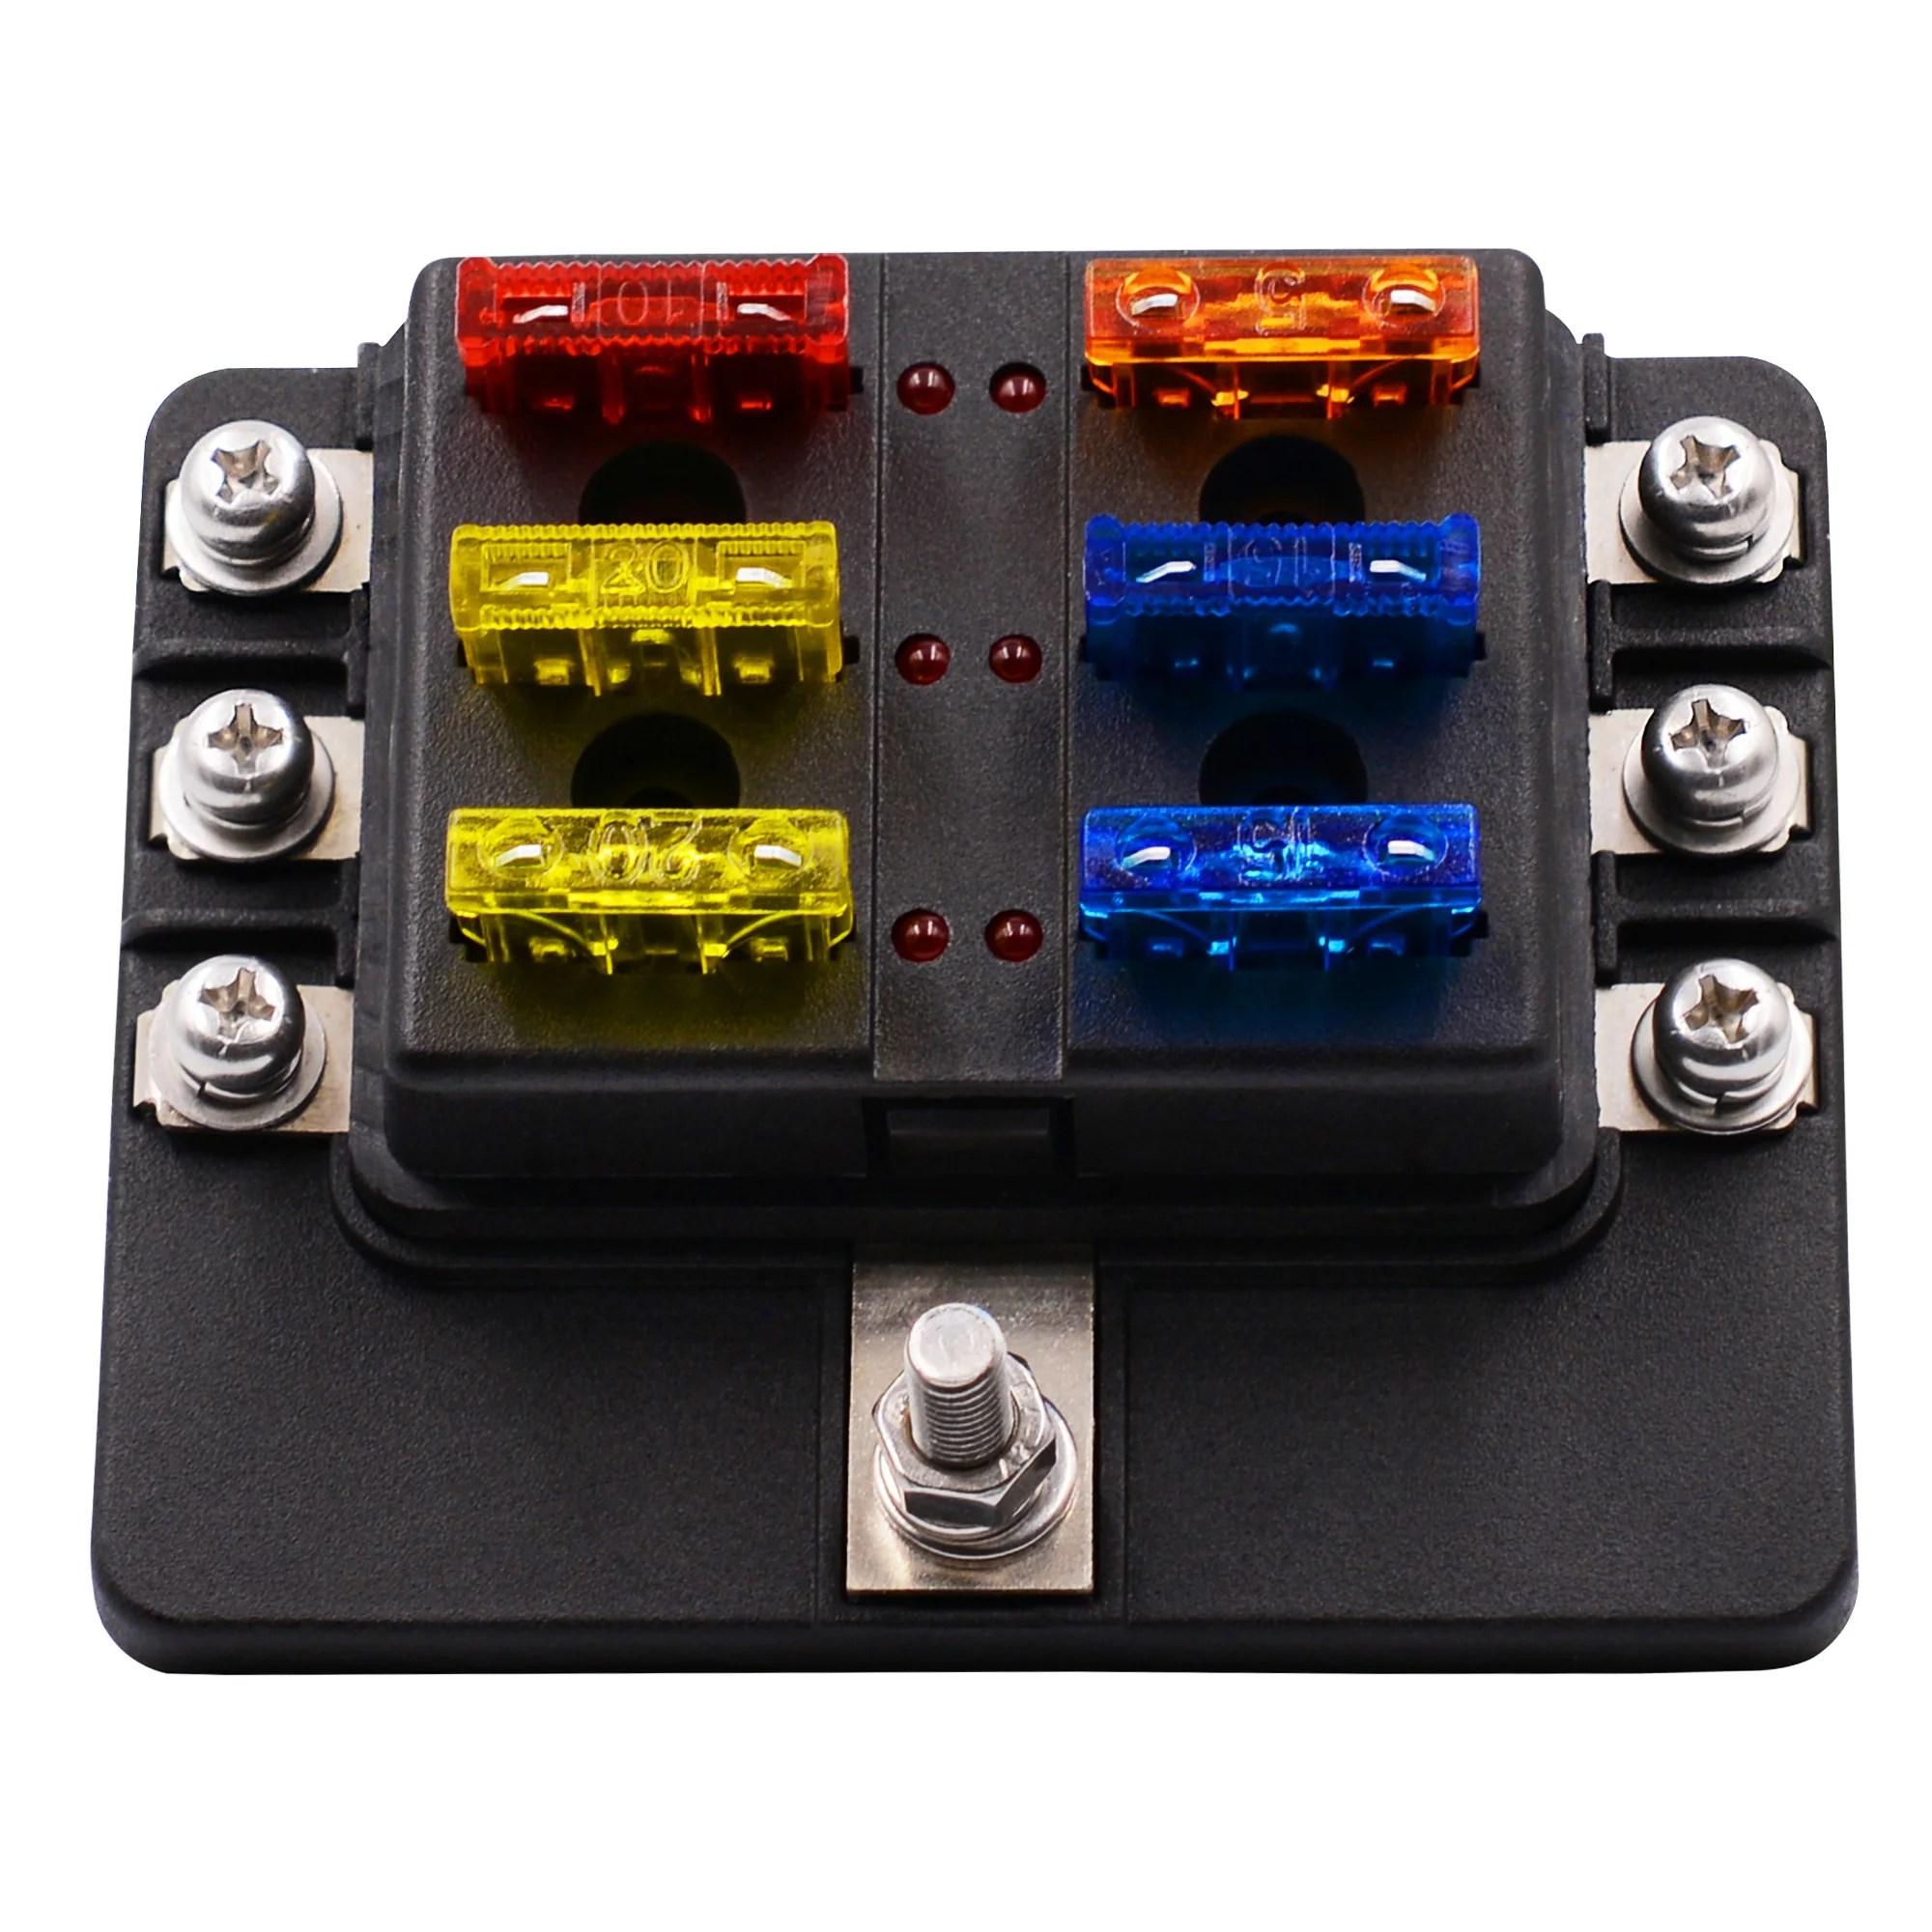 imars 6 way fuse box 12v 32v circuit standard blade block holder kit car caravan [ 2000 x 2000 Pixel ]